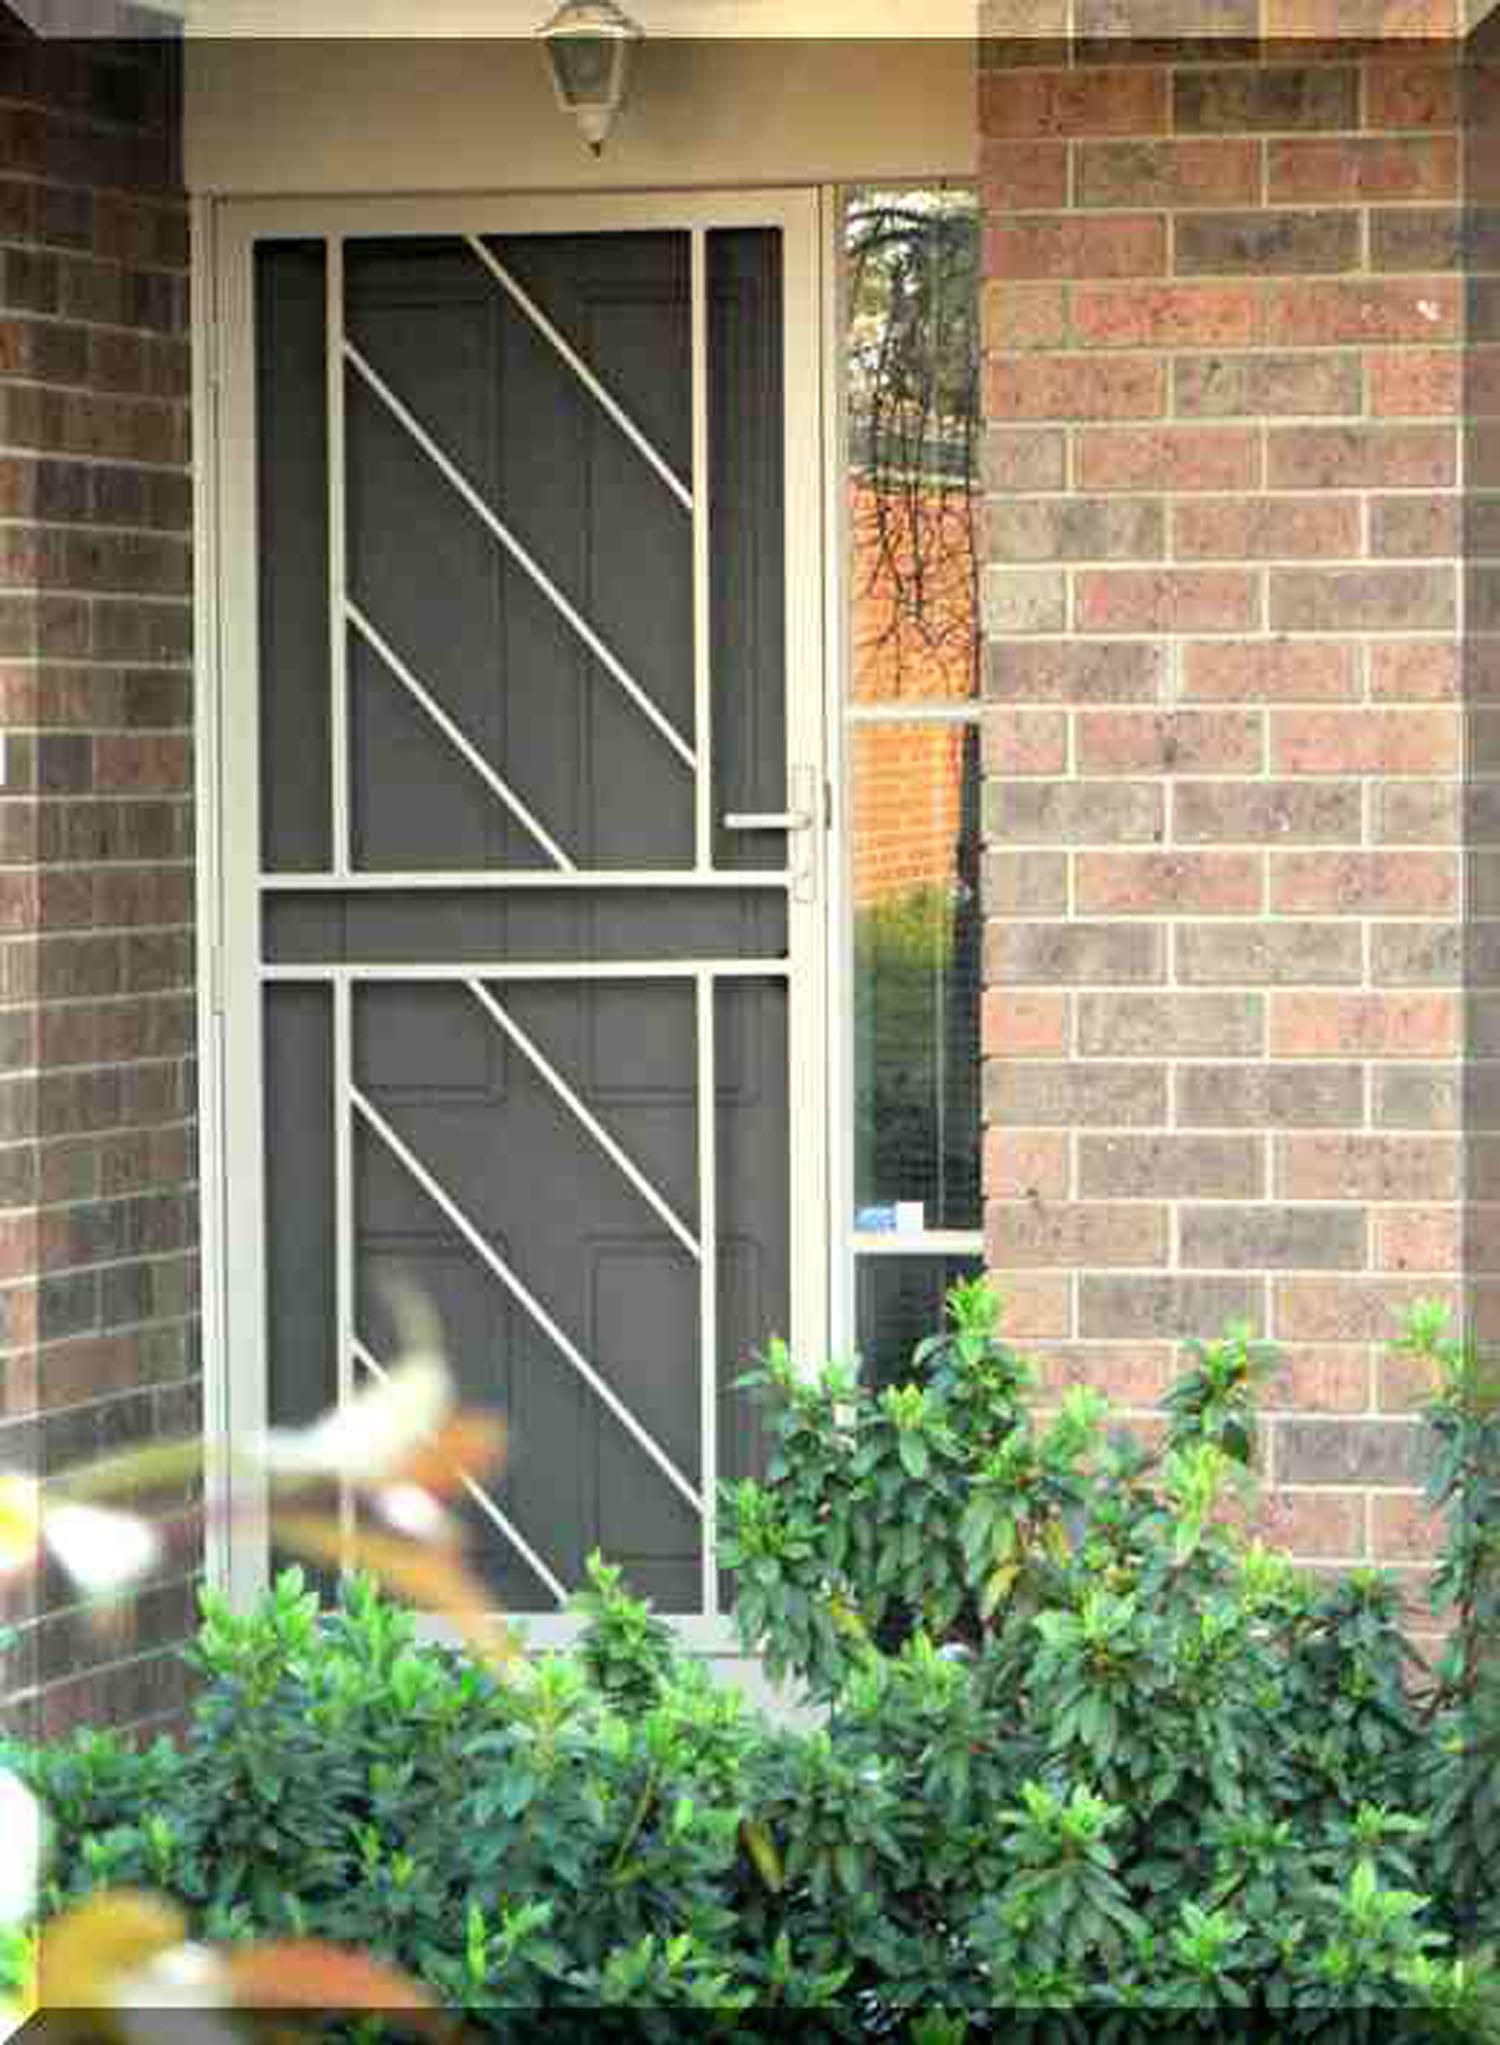 2045 #4C8B40 Security Doors pic Residential Security Doors Exterior 41111500